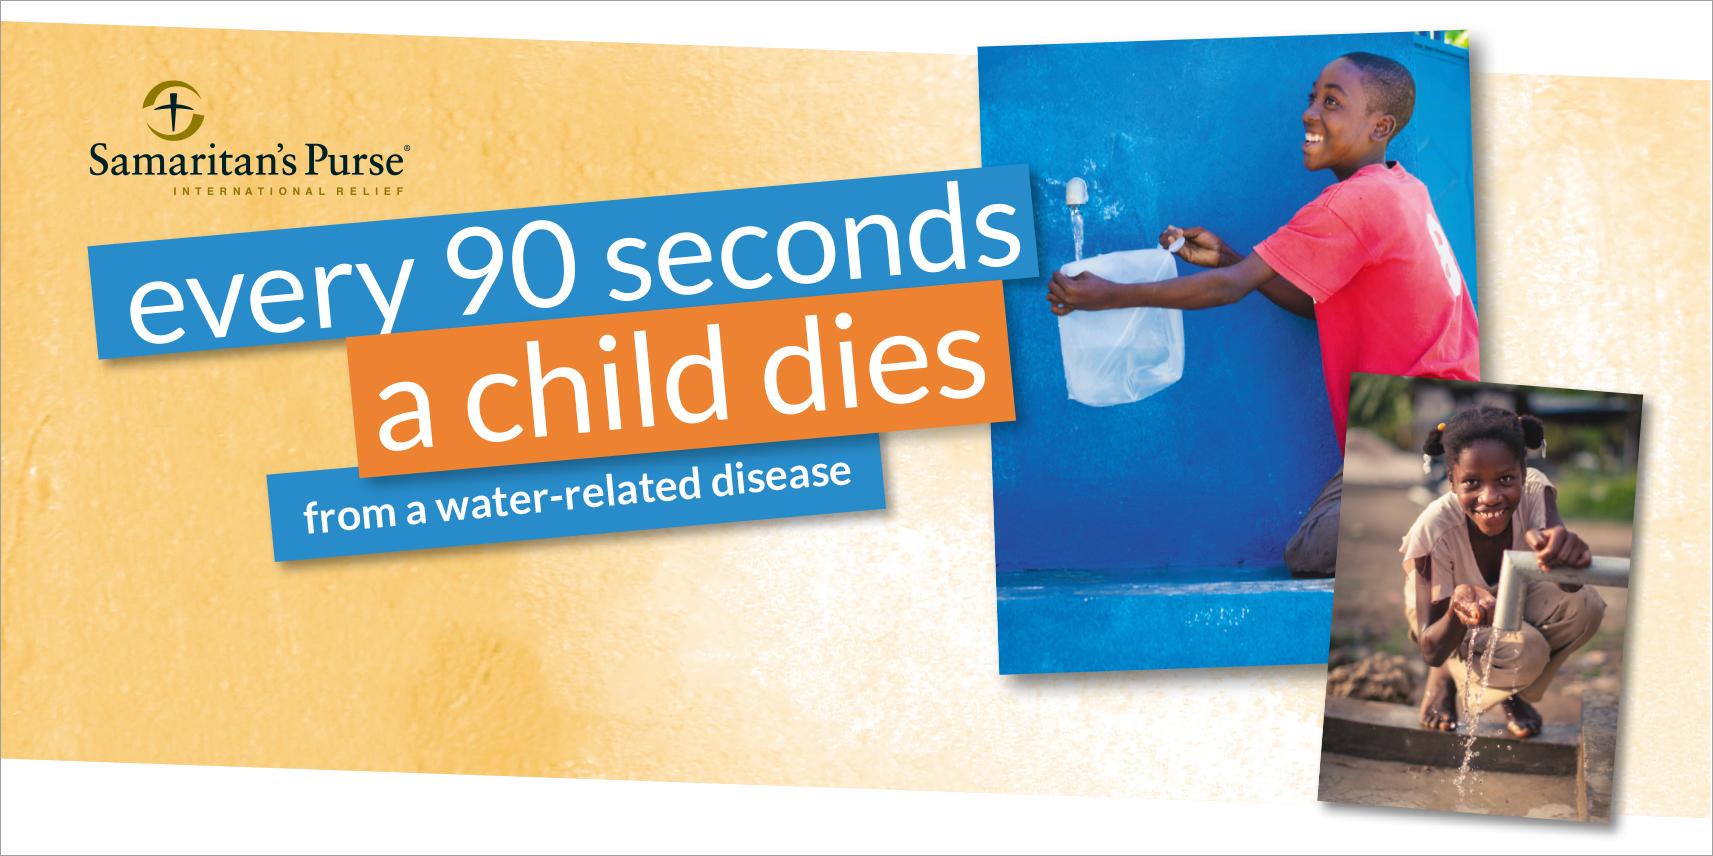 Water Appeal campaign design for Samaritans Purse